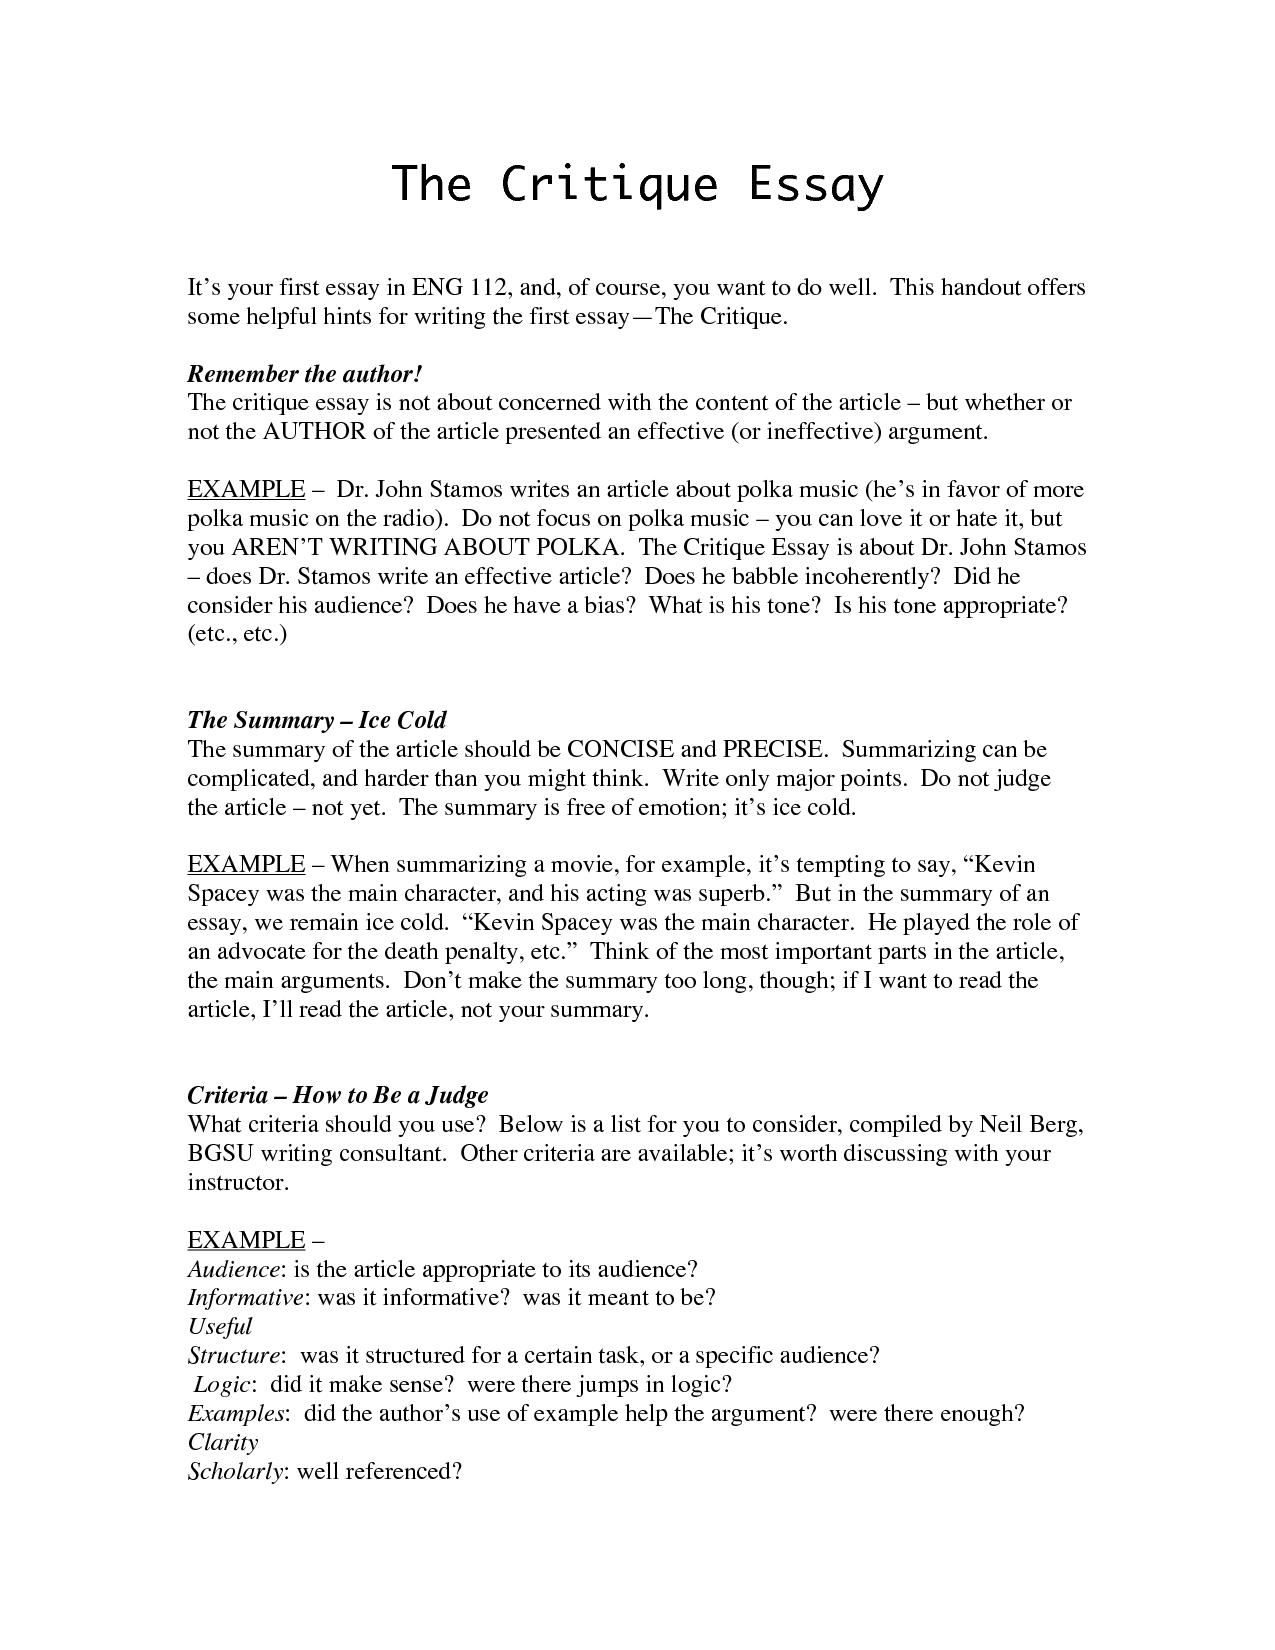 Examples of critique essays